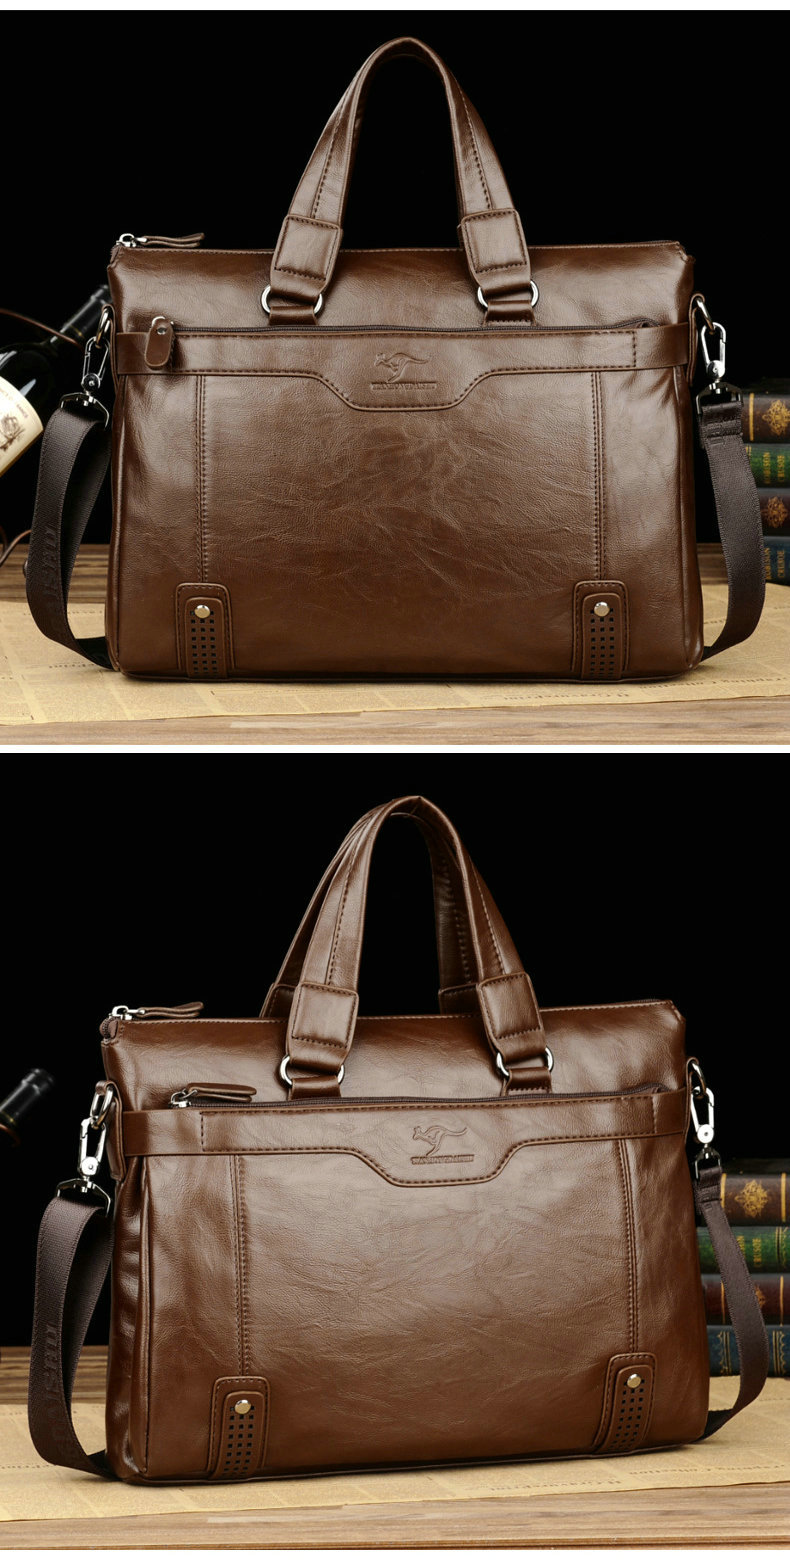 HTB1h5XBelGE3KVjSZFhq6AkaFXaL Cowhide Leather men's Briefcase men laptop male messenger bag Men's shoulder bags briefcases for documents bag